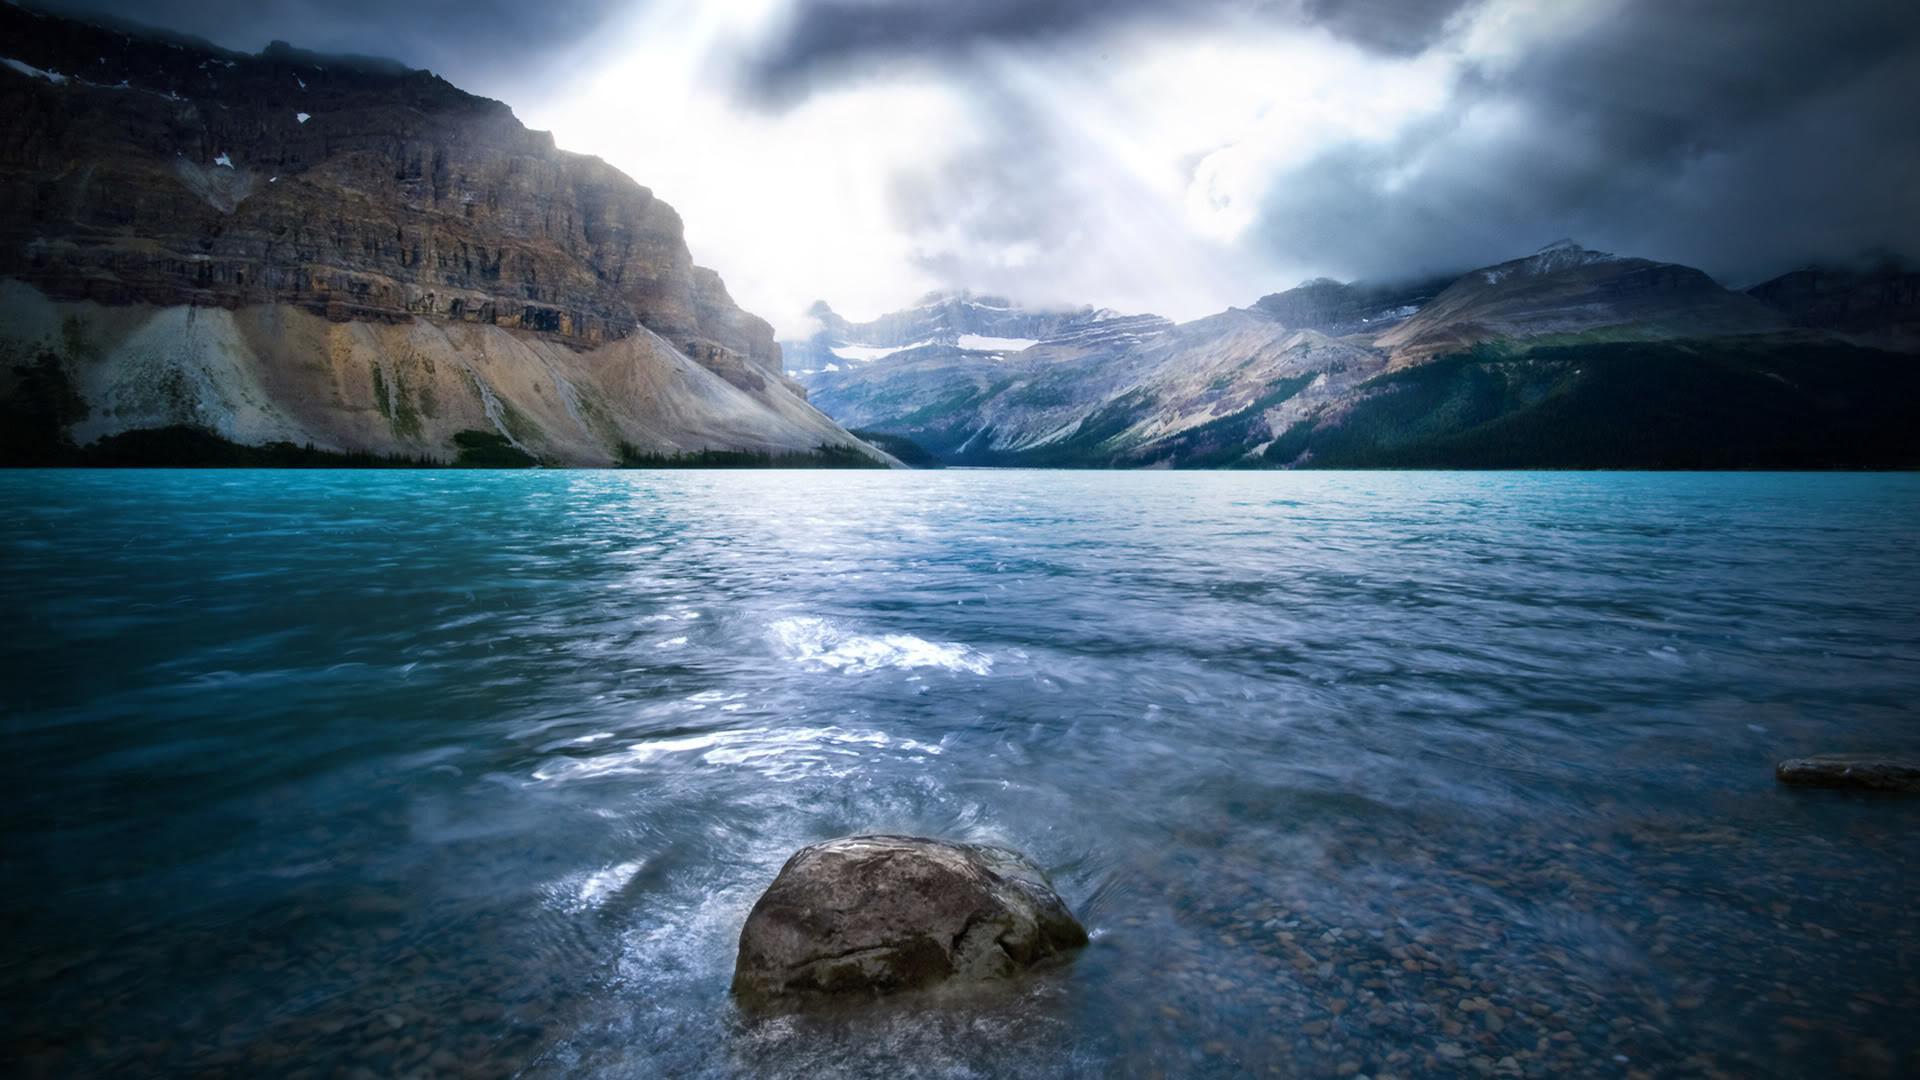 Amazing Ocean Wallpapers HD images